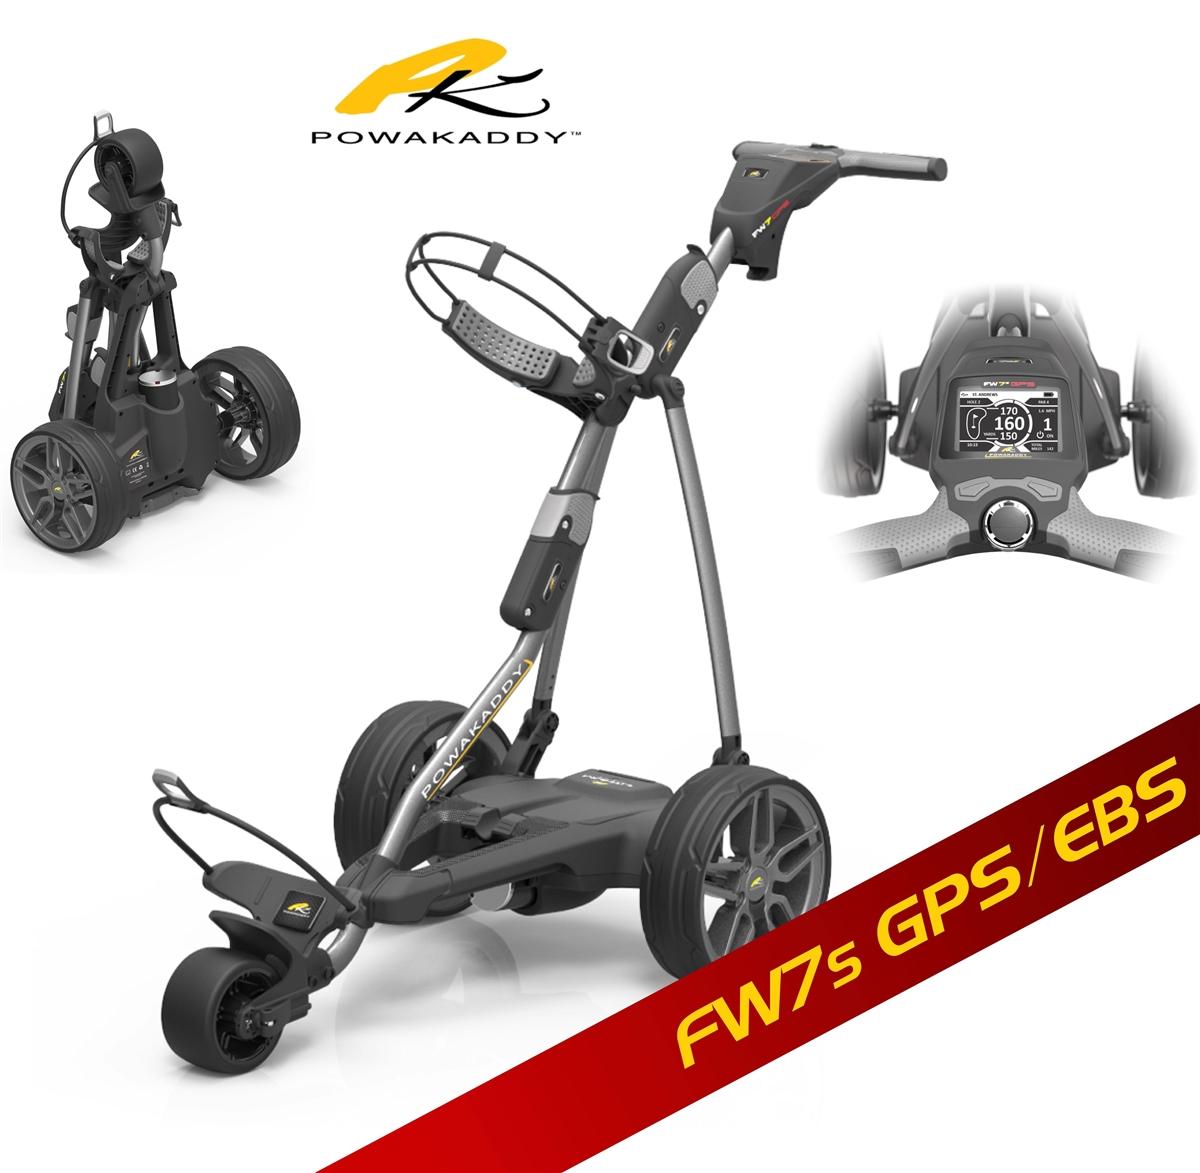 PowaKaddy FW7S GPS/EBS - Lithium Battery Electric Golf Caddy